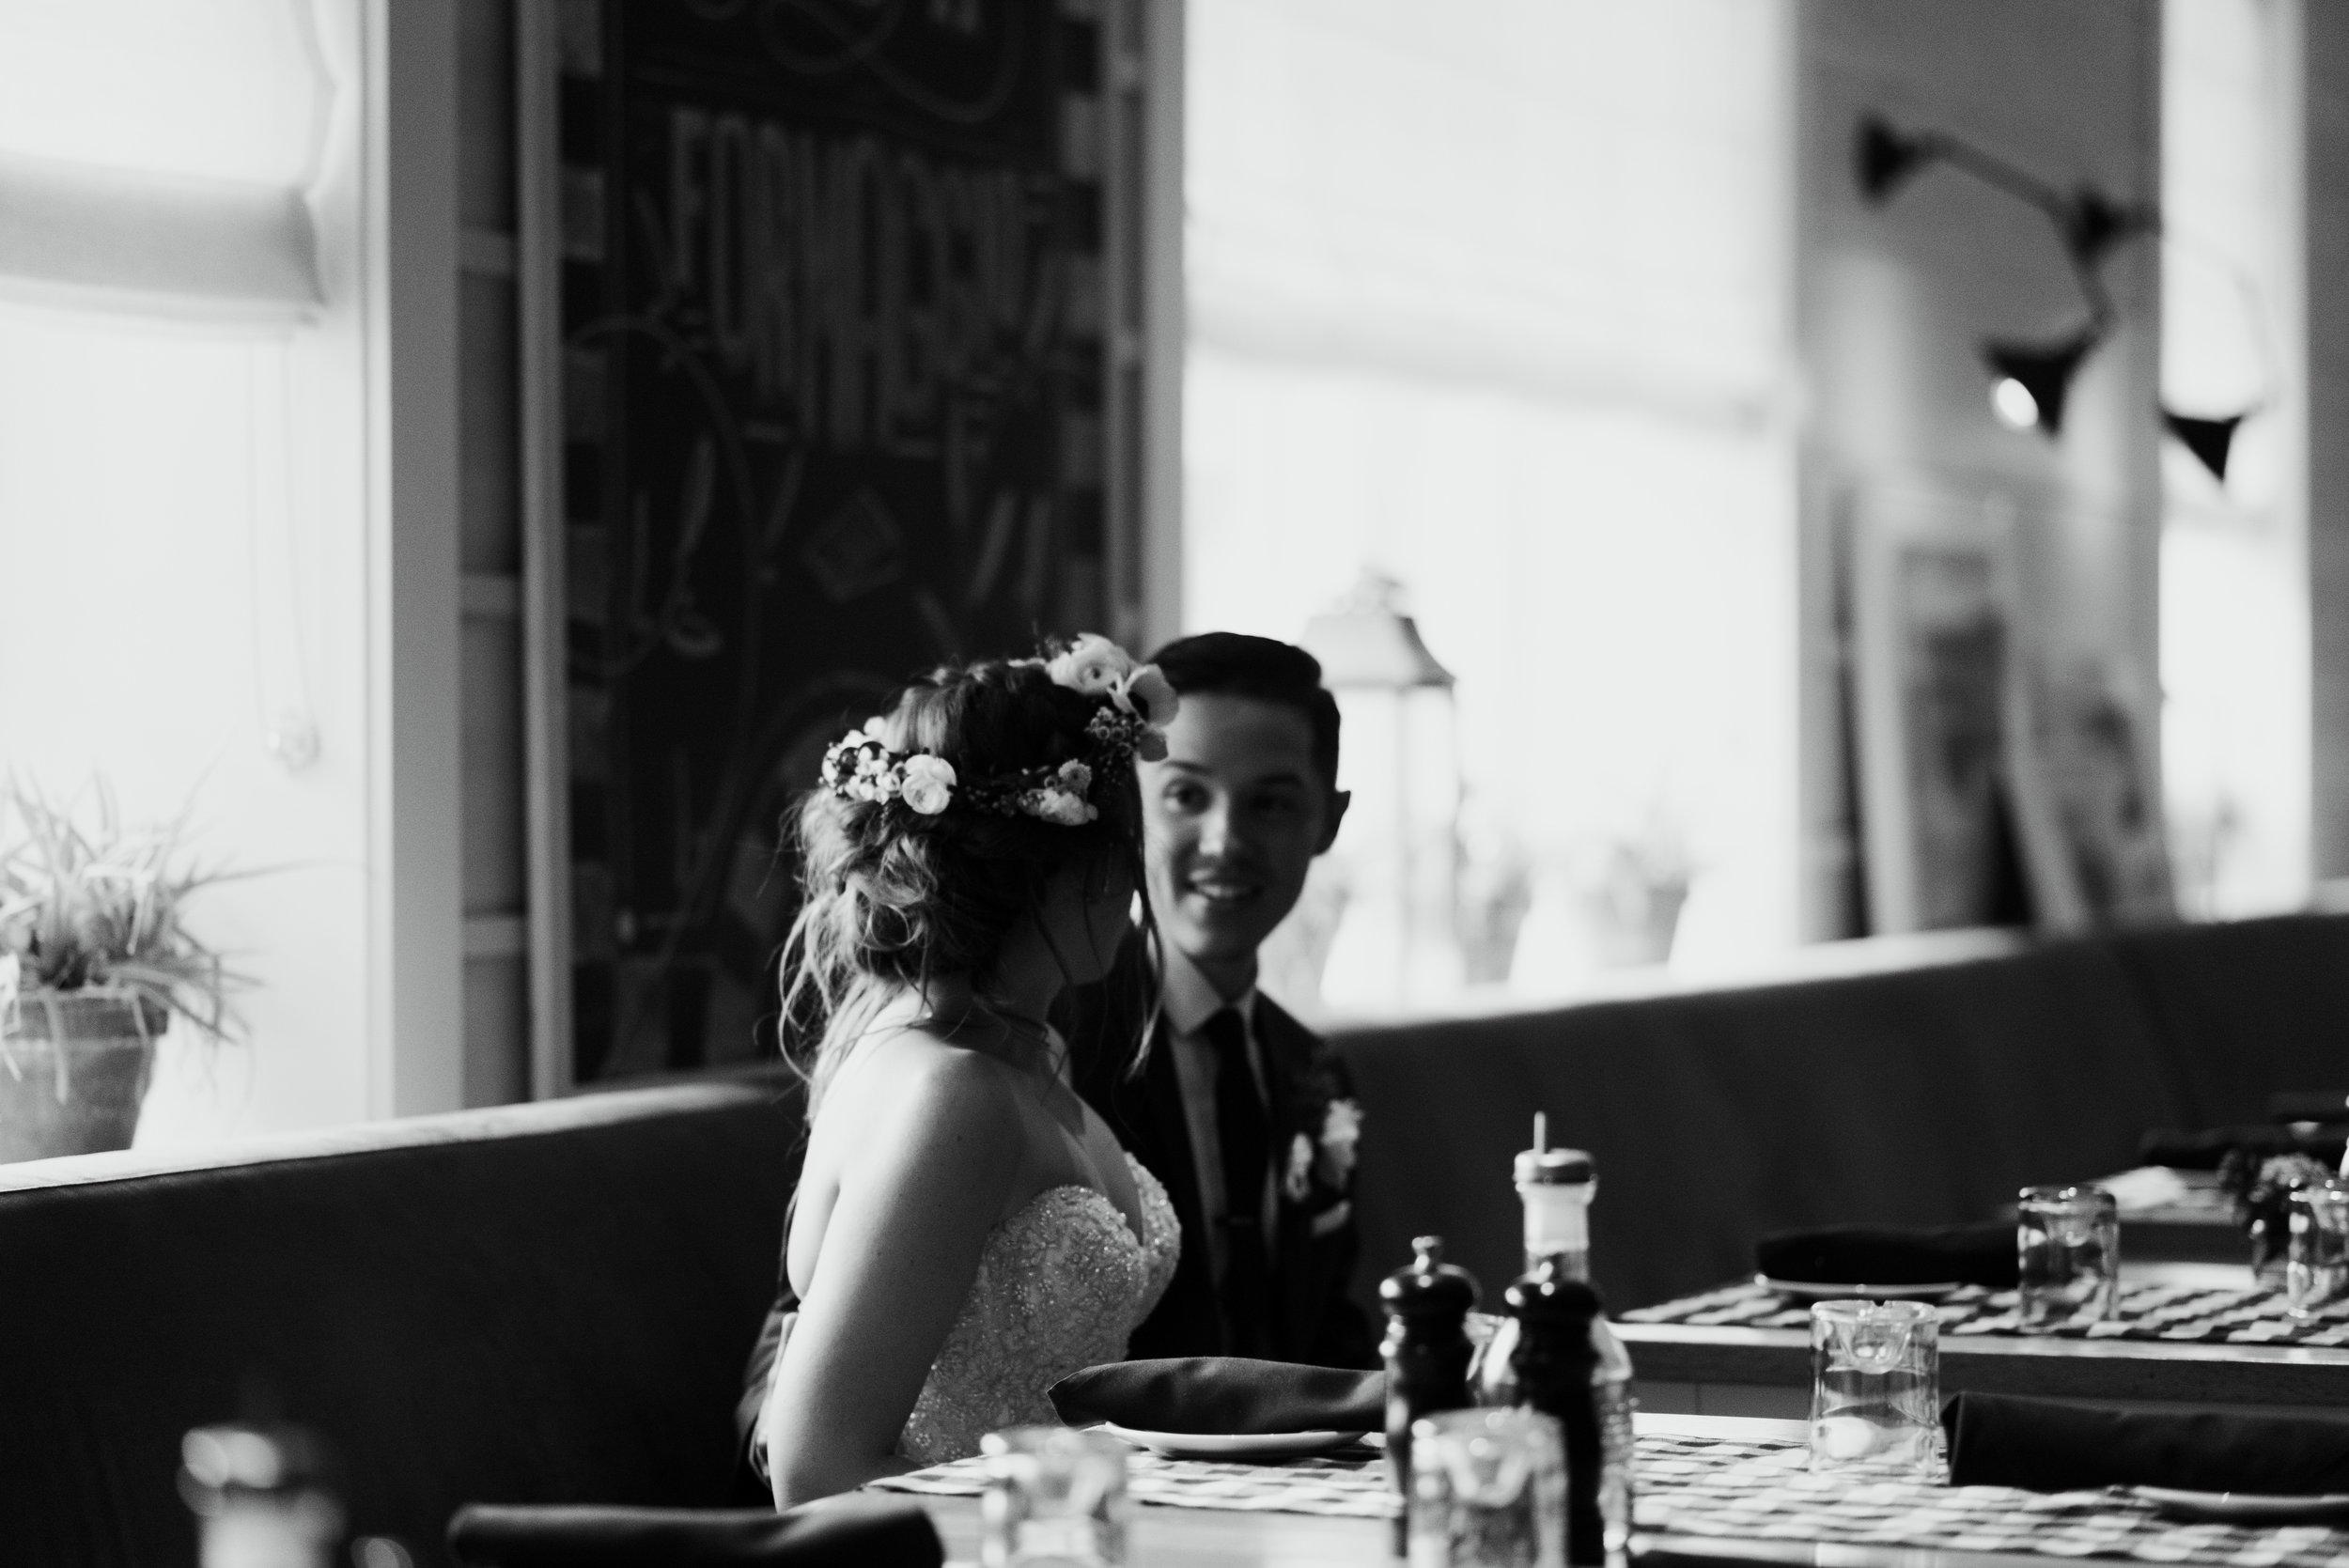 savannah-station-elopement-photographer-savannah-elopement-photography-savannah-georgia-elopement-photographer-savannah-wedding-photographer-meg-hill-photo-jade-hill- (30 of 93).jpg